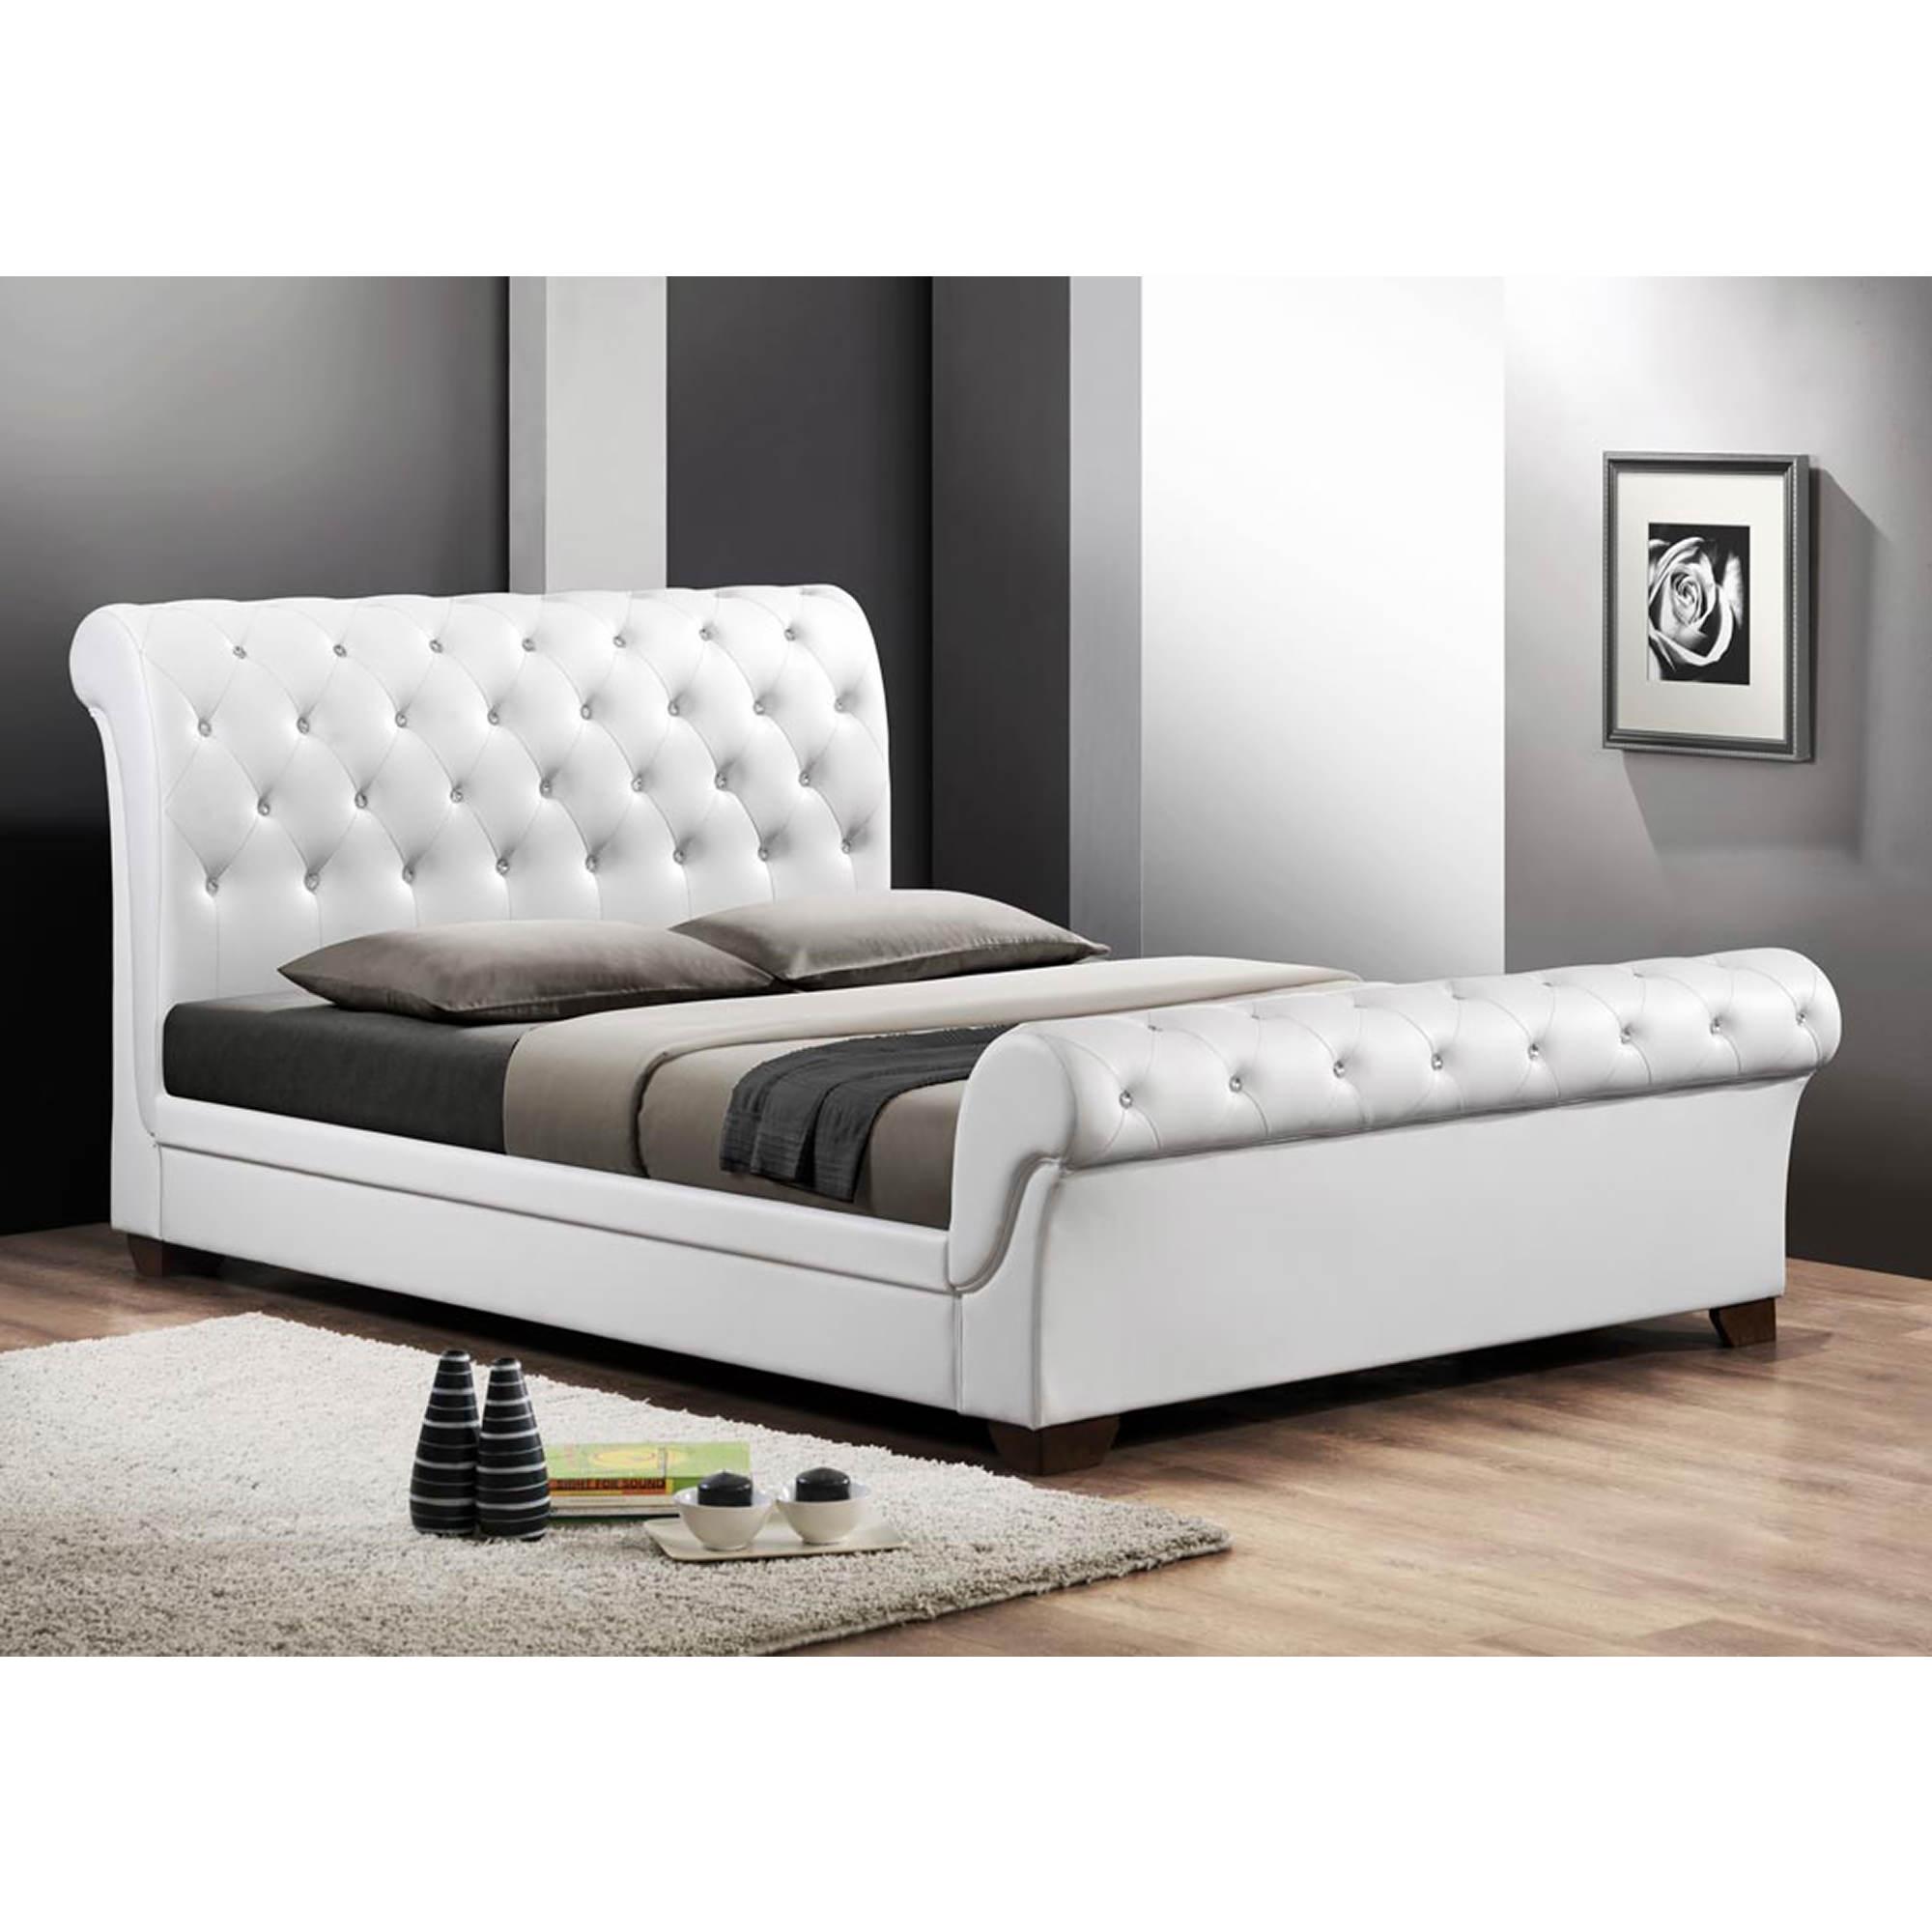 Baxton Studio Leighlin Fullsize Sleigh Bed With Upholstered Headboard   White